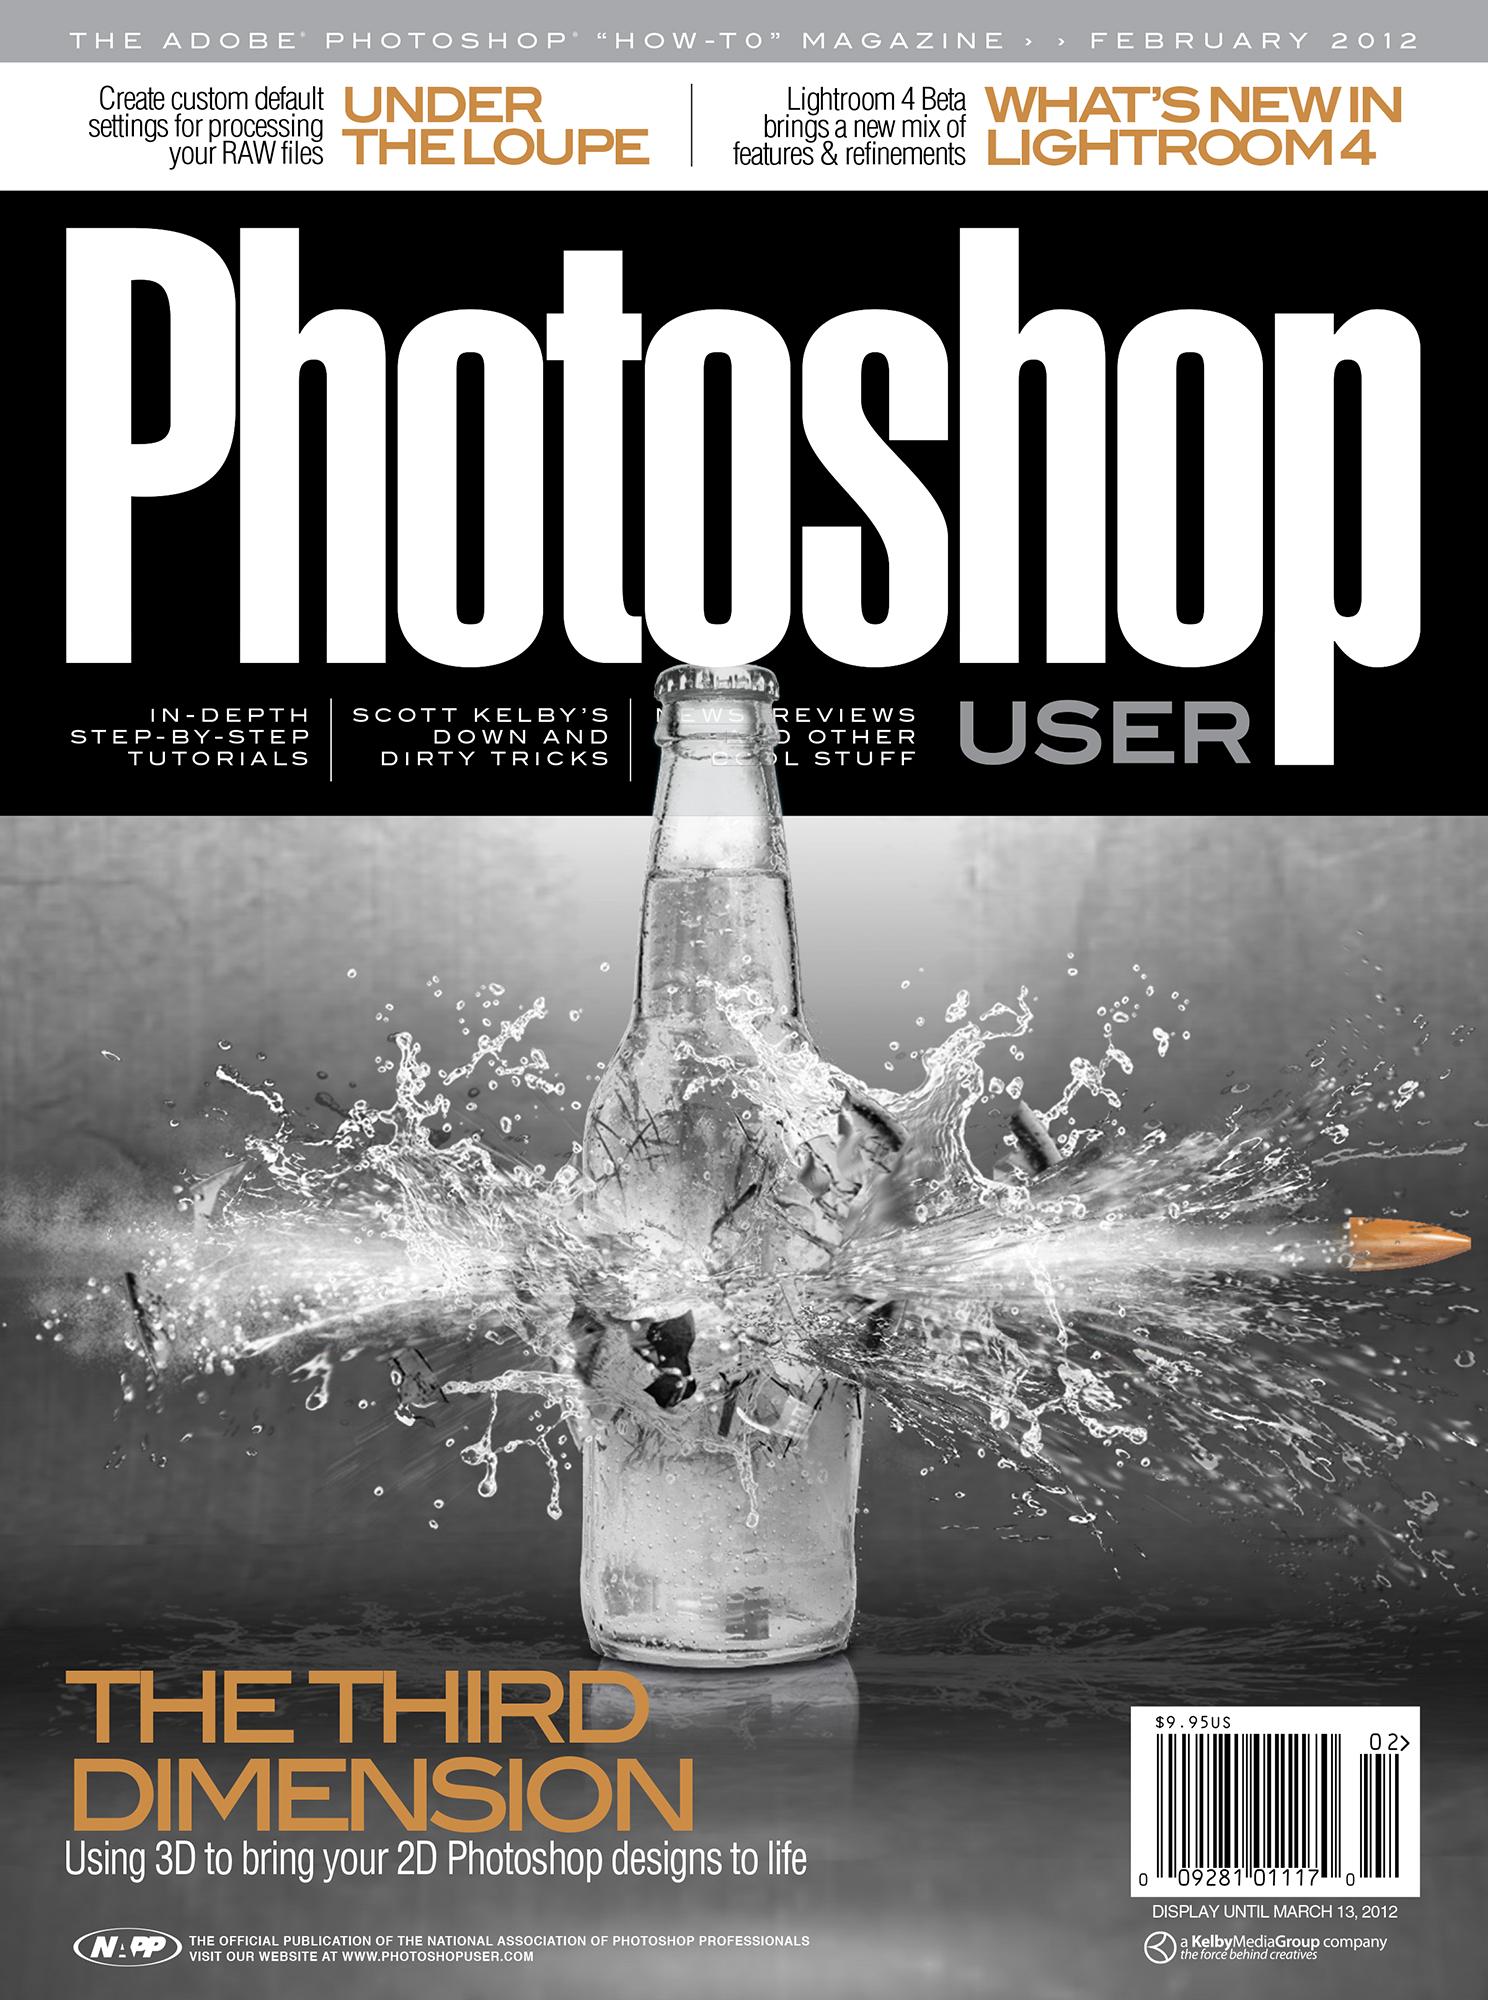 Photoshop User Magazine 2012